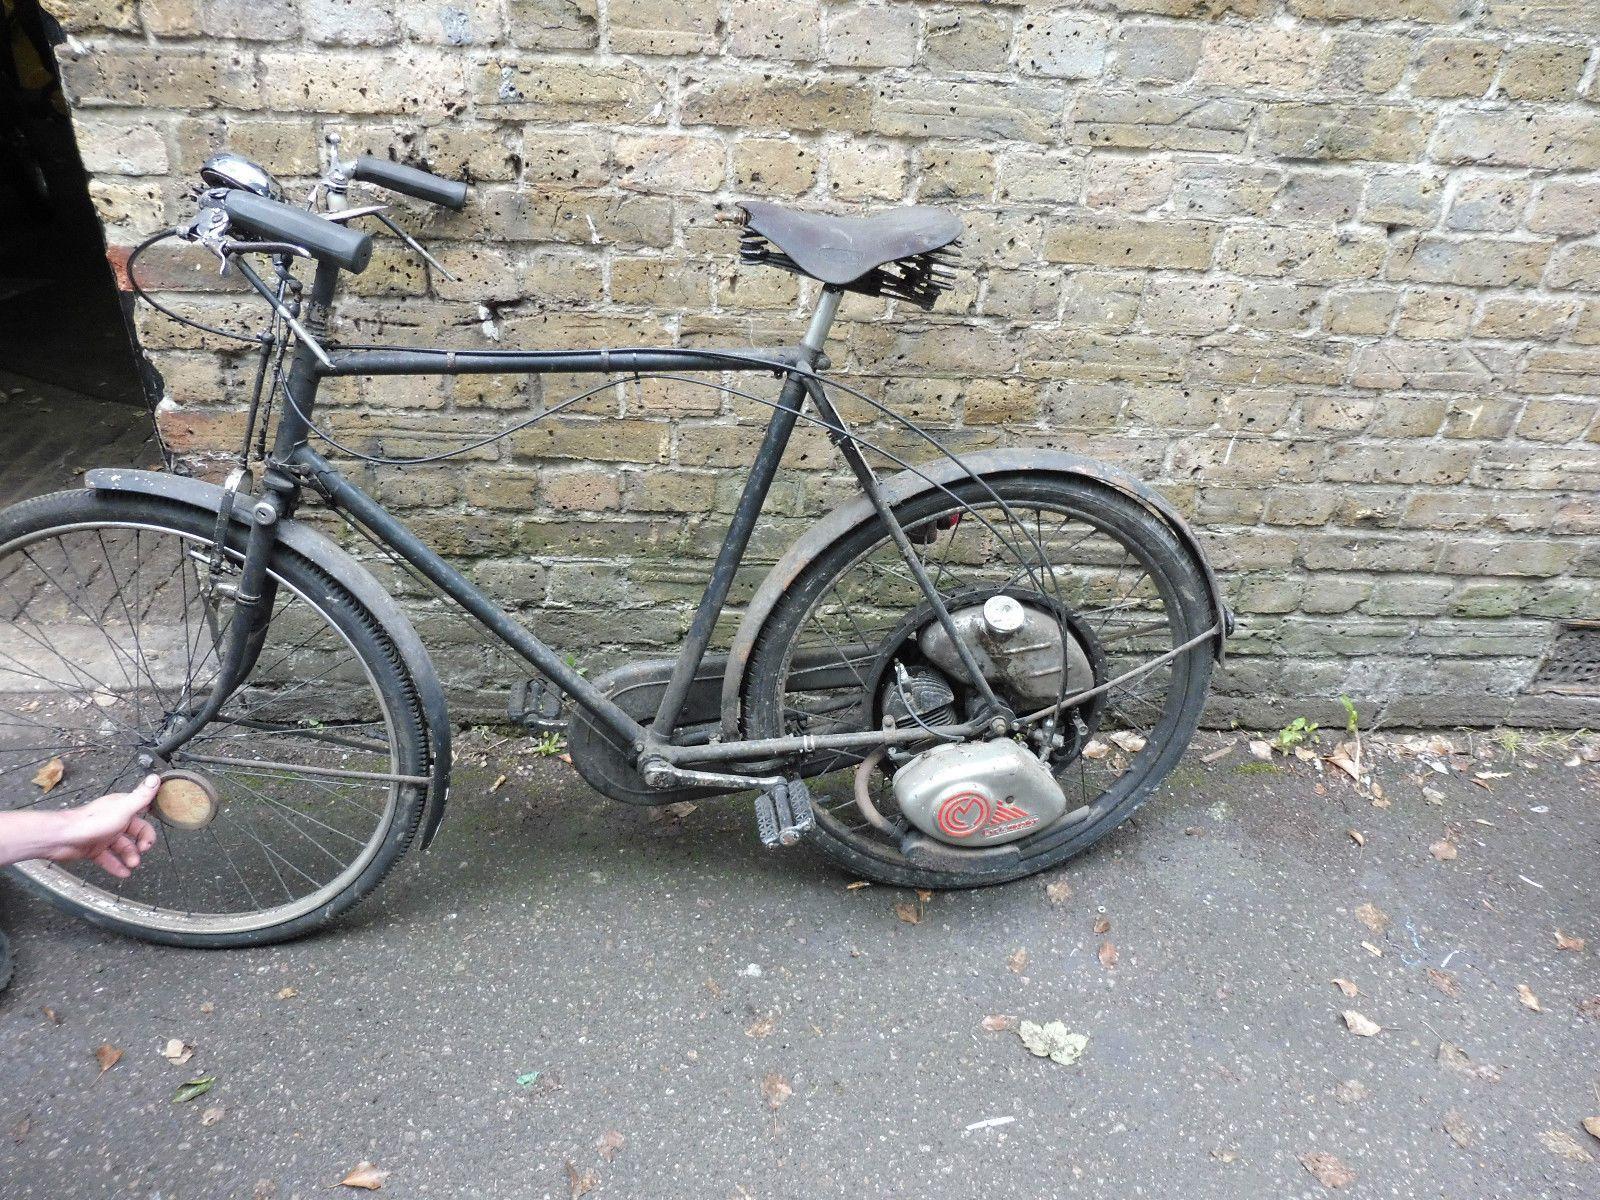 Autocycle Cyclemaster Project Suzuki Motorcycle Vintage Bikes Motorcycle